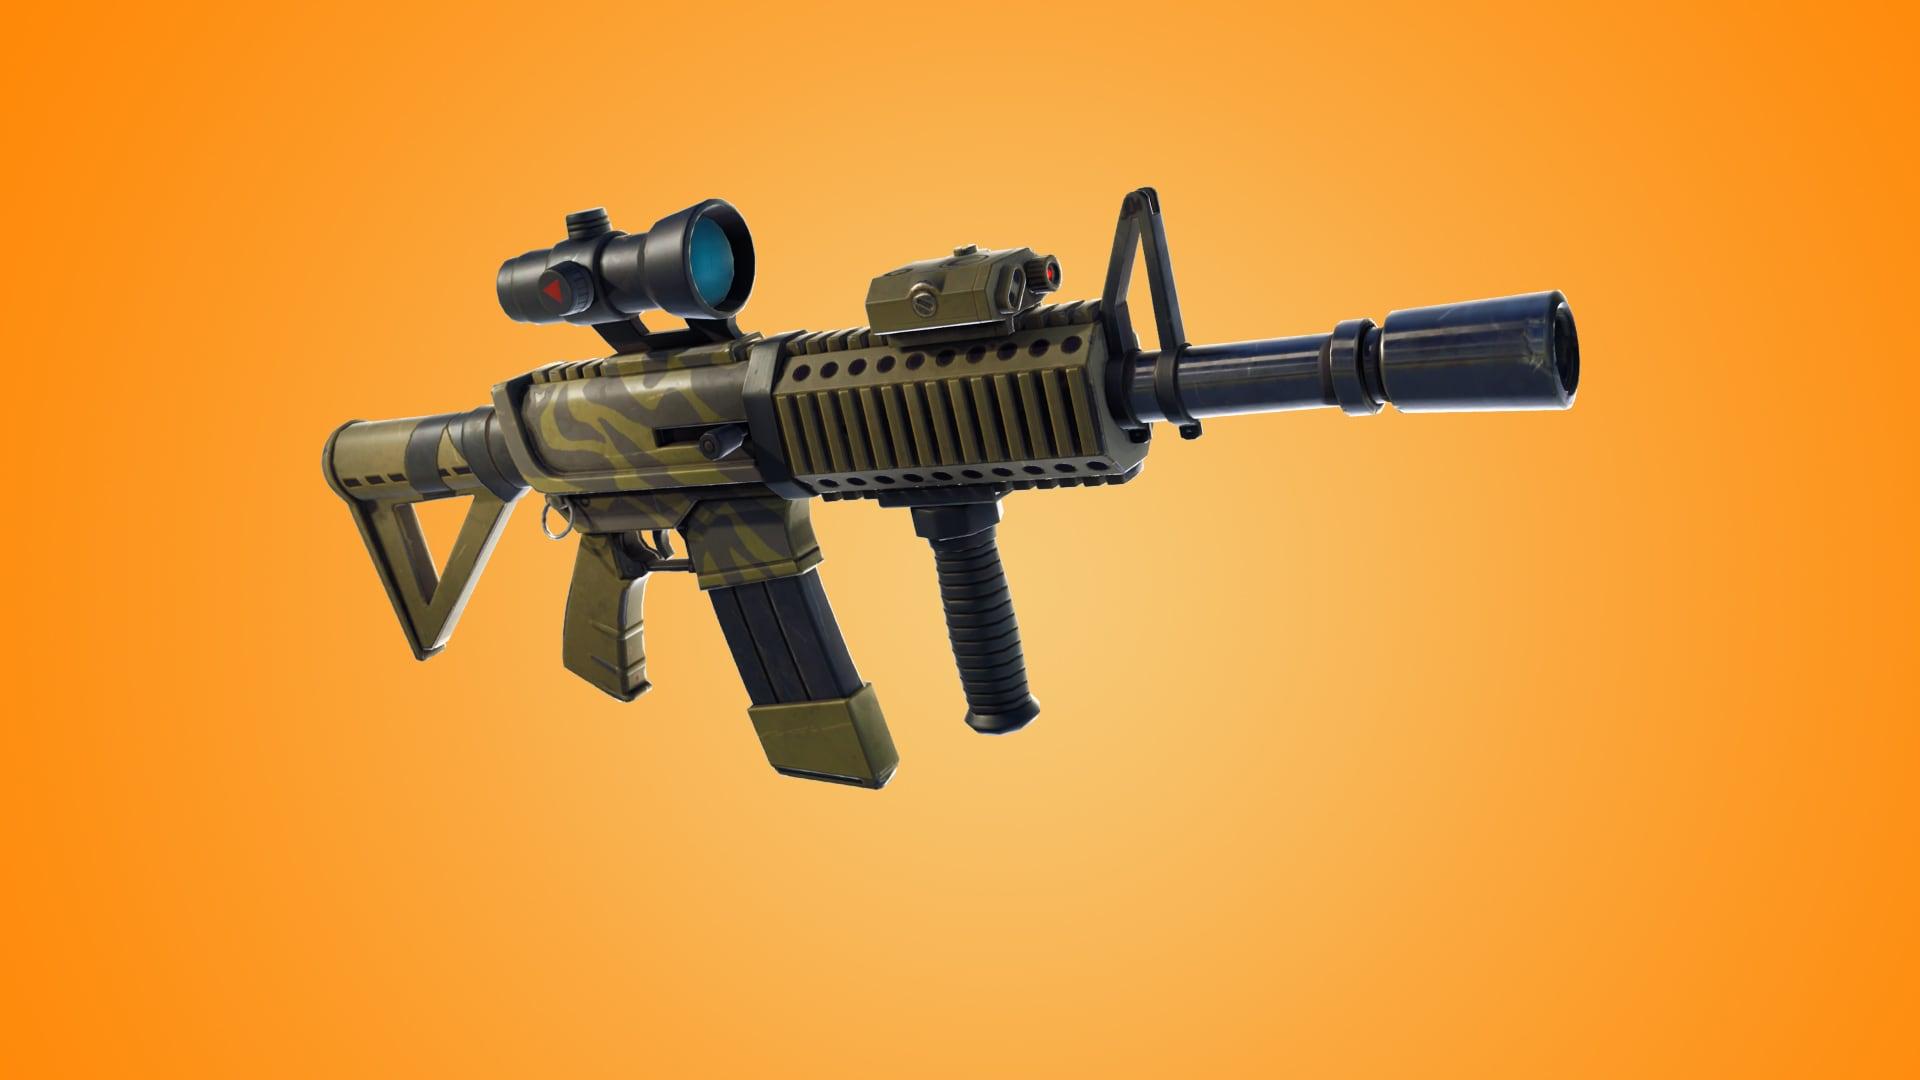 fortnite-patch-v4-4-fucile-assalto-mirino-termico